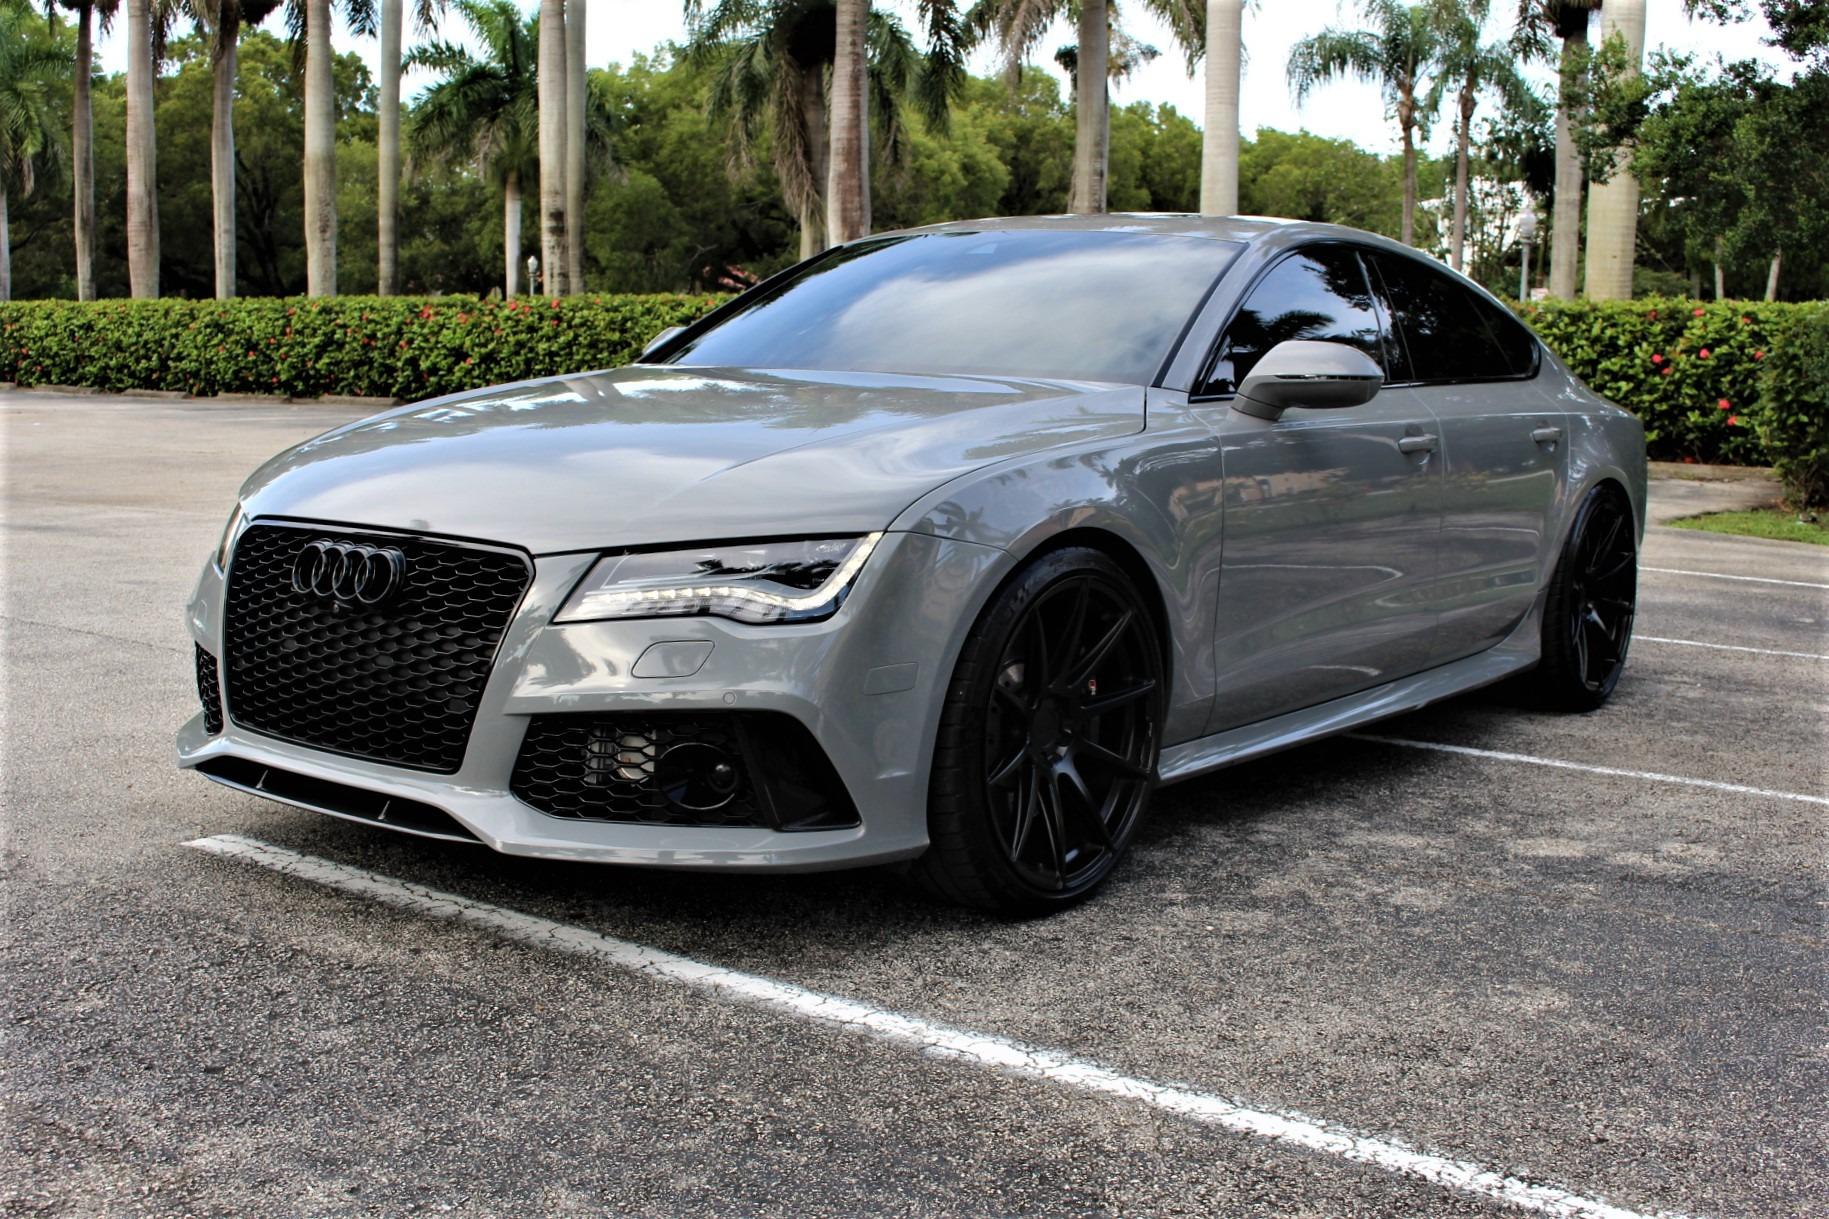 Used 2015 Audi RS 7 4.0T quattro Prestige for sale Sold at The Gables Sports Cars in Miami FL 33146 4